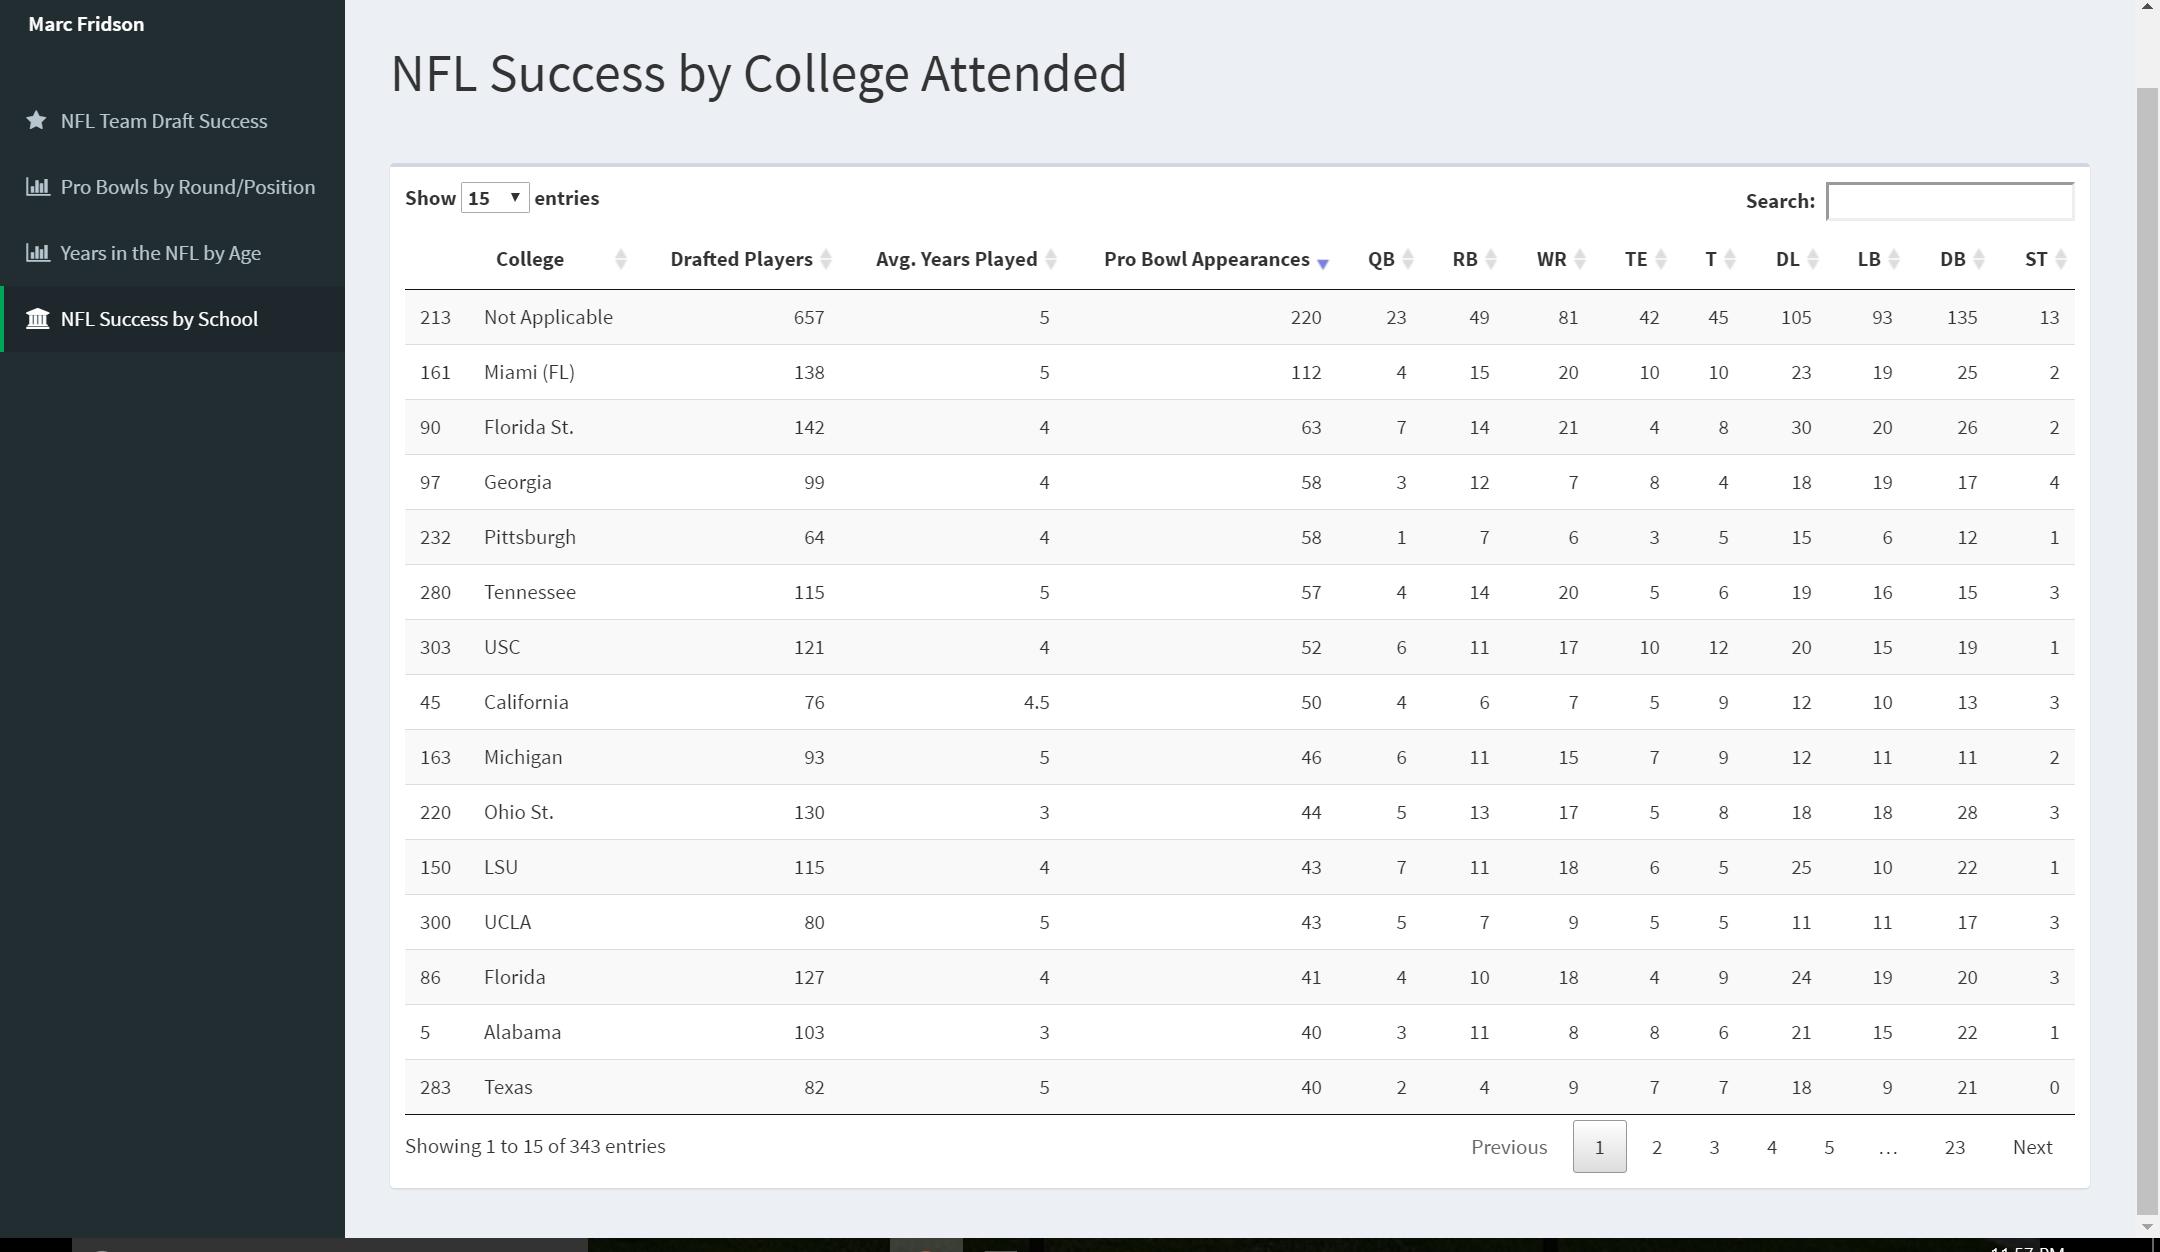 NFL College Success